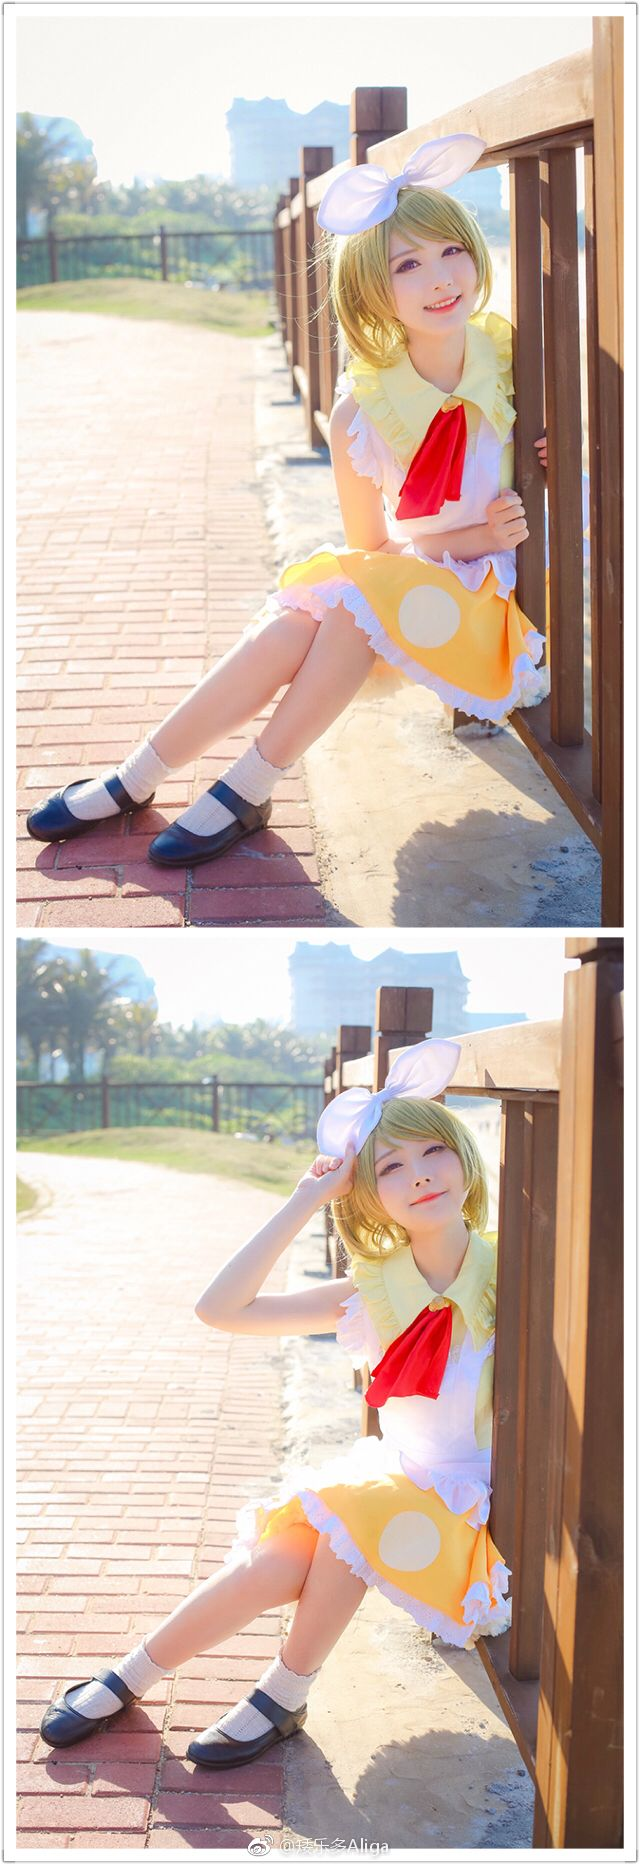 character :小泉花陽 koizumi hanayo   /   cosplayer :矮乐多Aliga